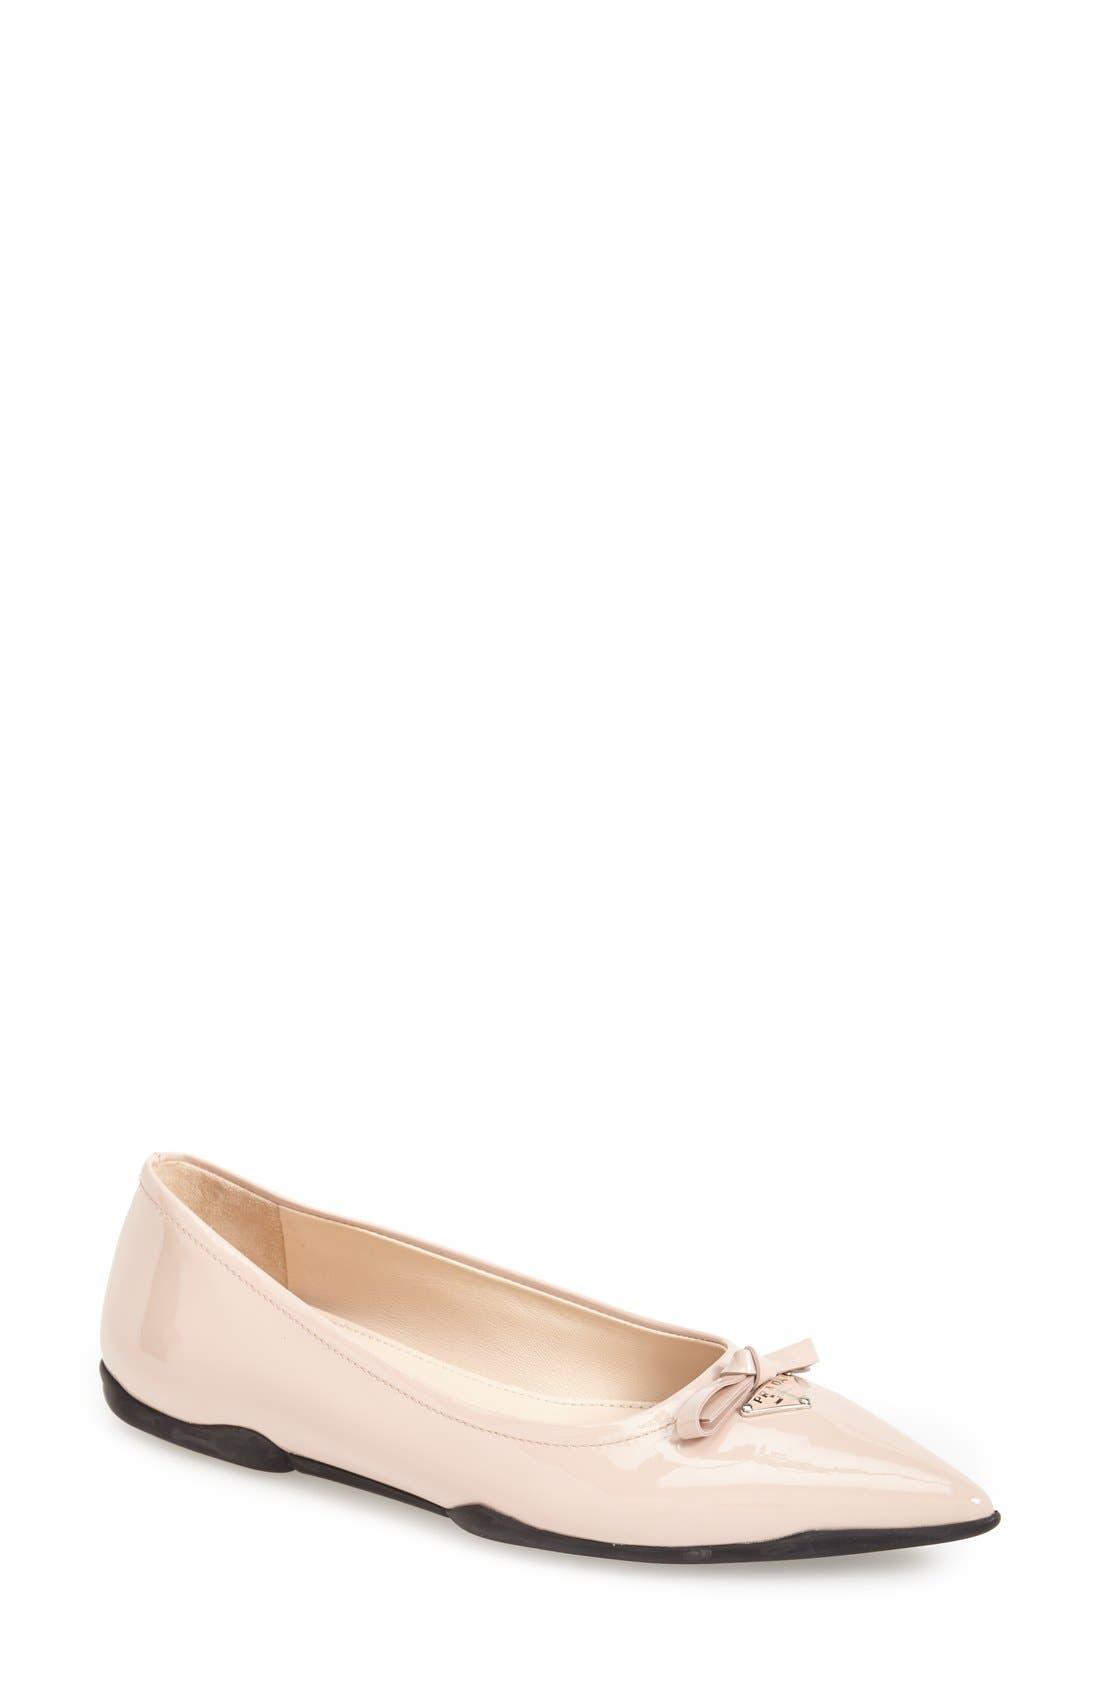 Alternate Image 1 Selected - Prada Pointy Toe Flat (Women)